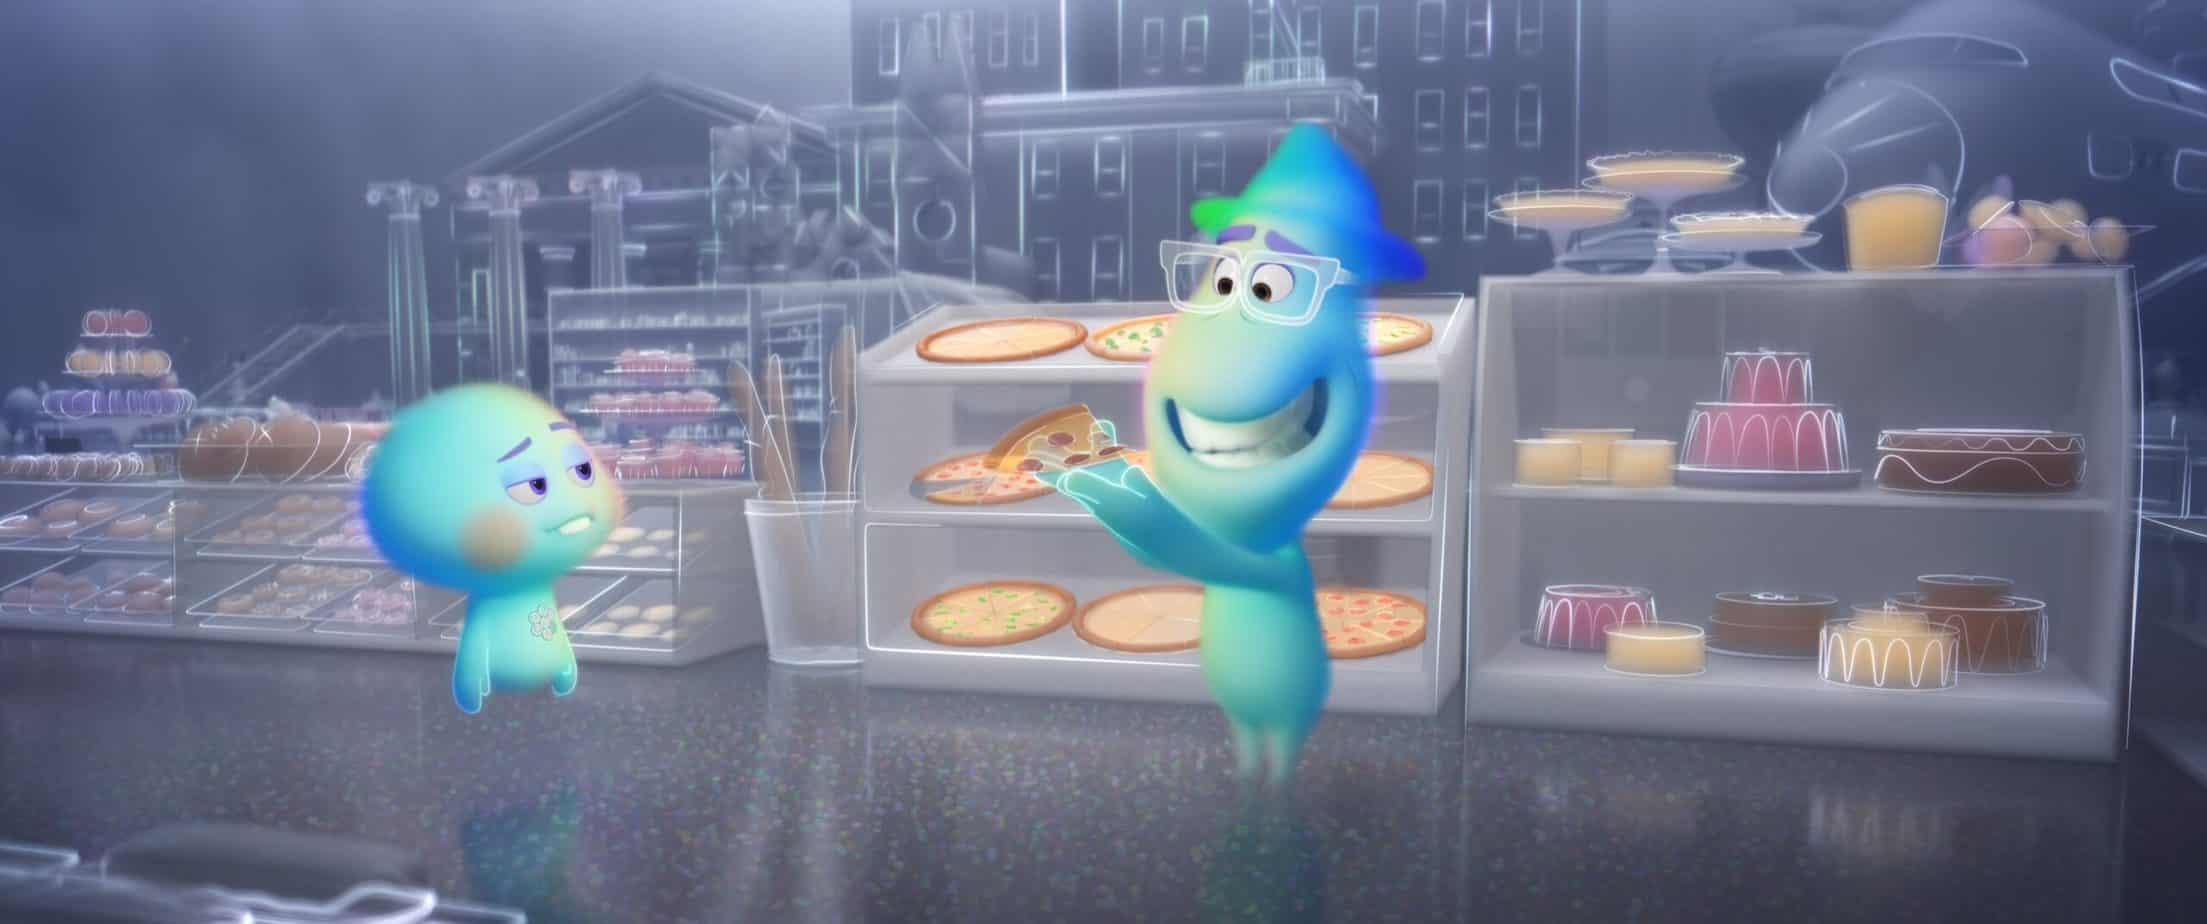 disney pixar soul activity sheets free pdf download